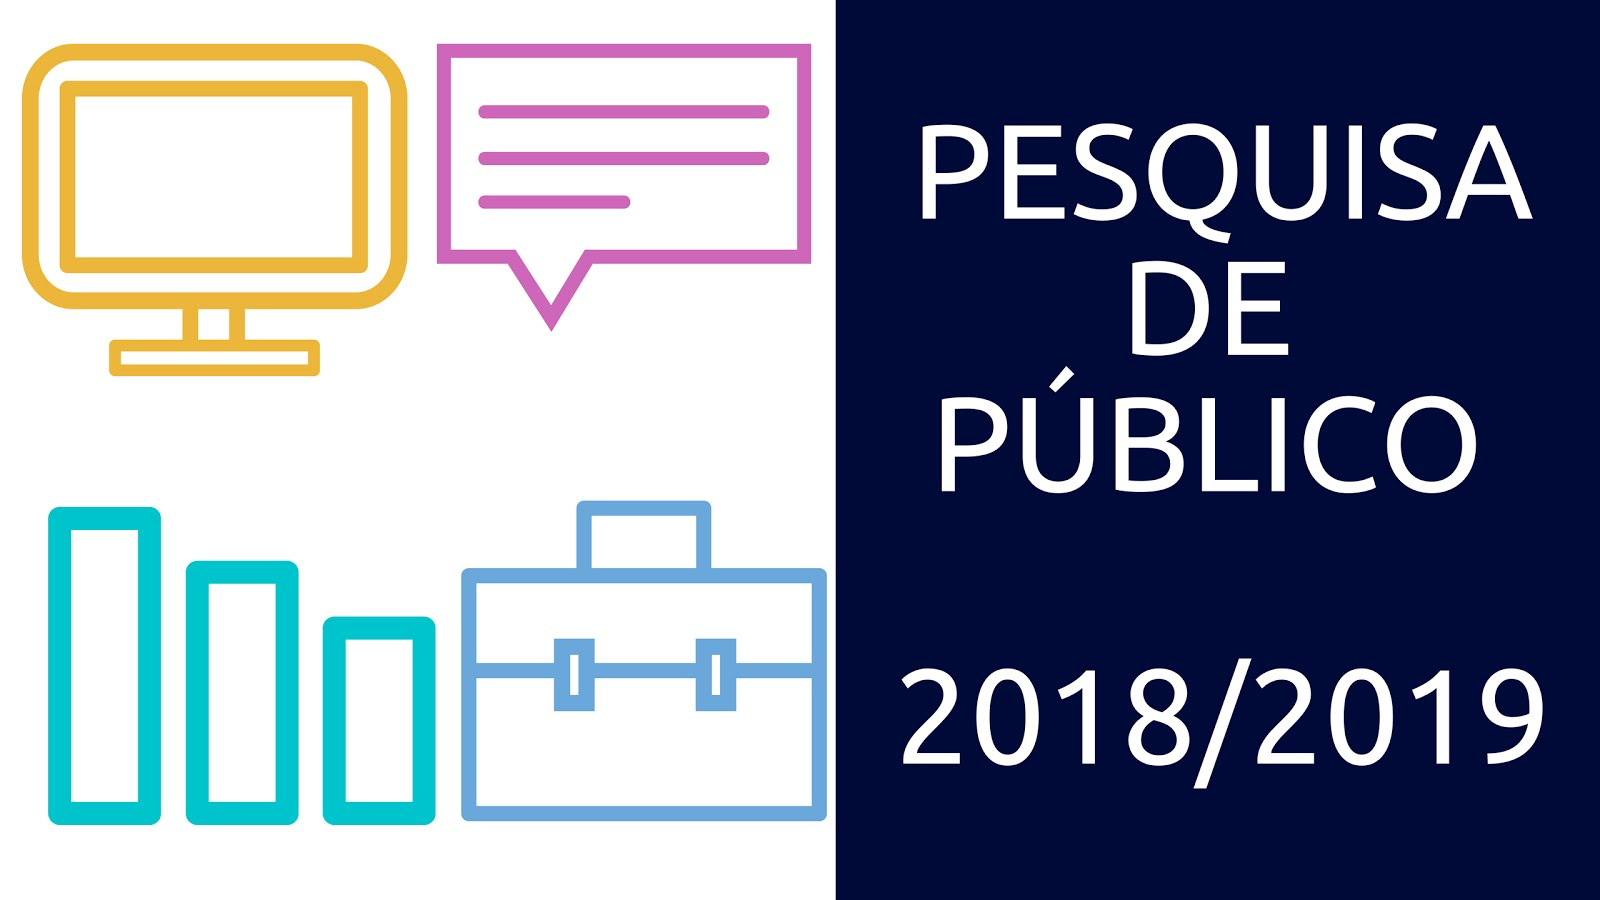 Pesquisa de Público 2018/2019